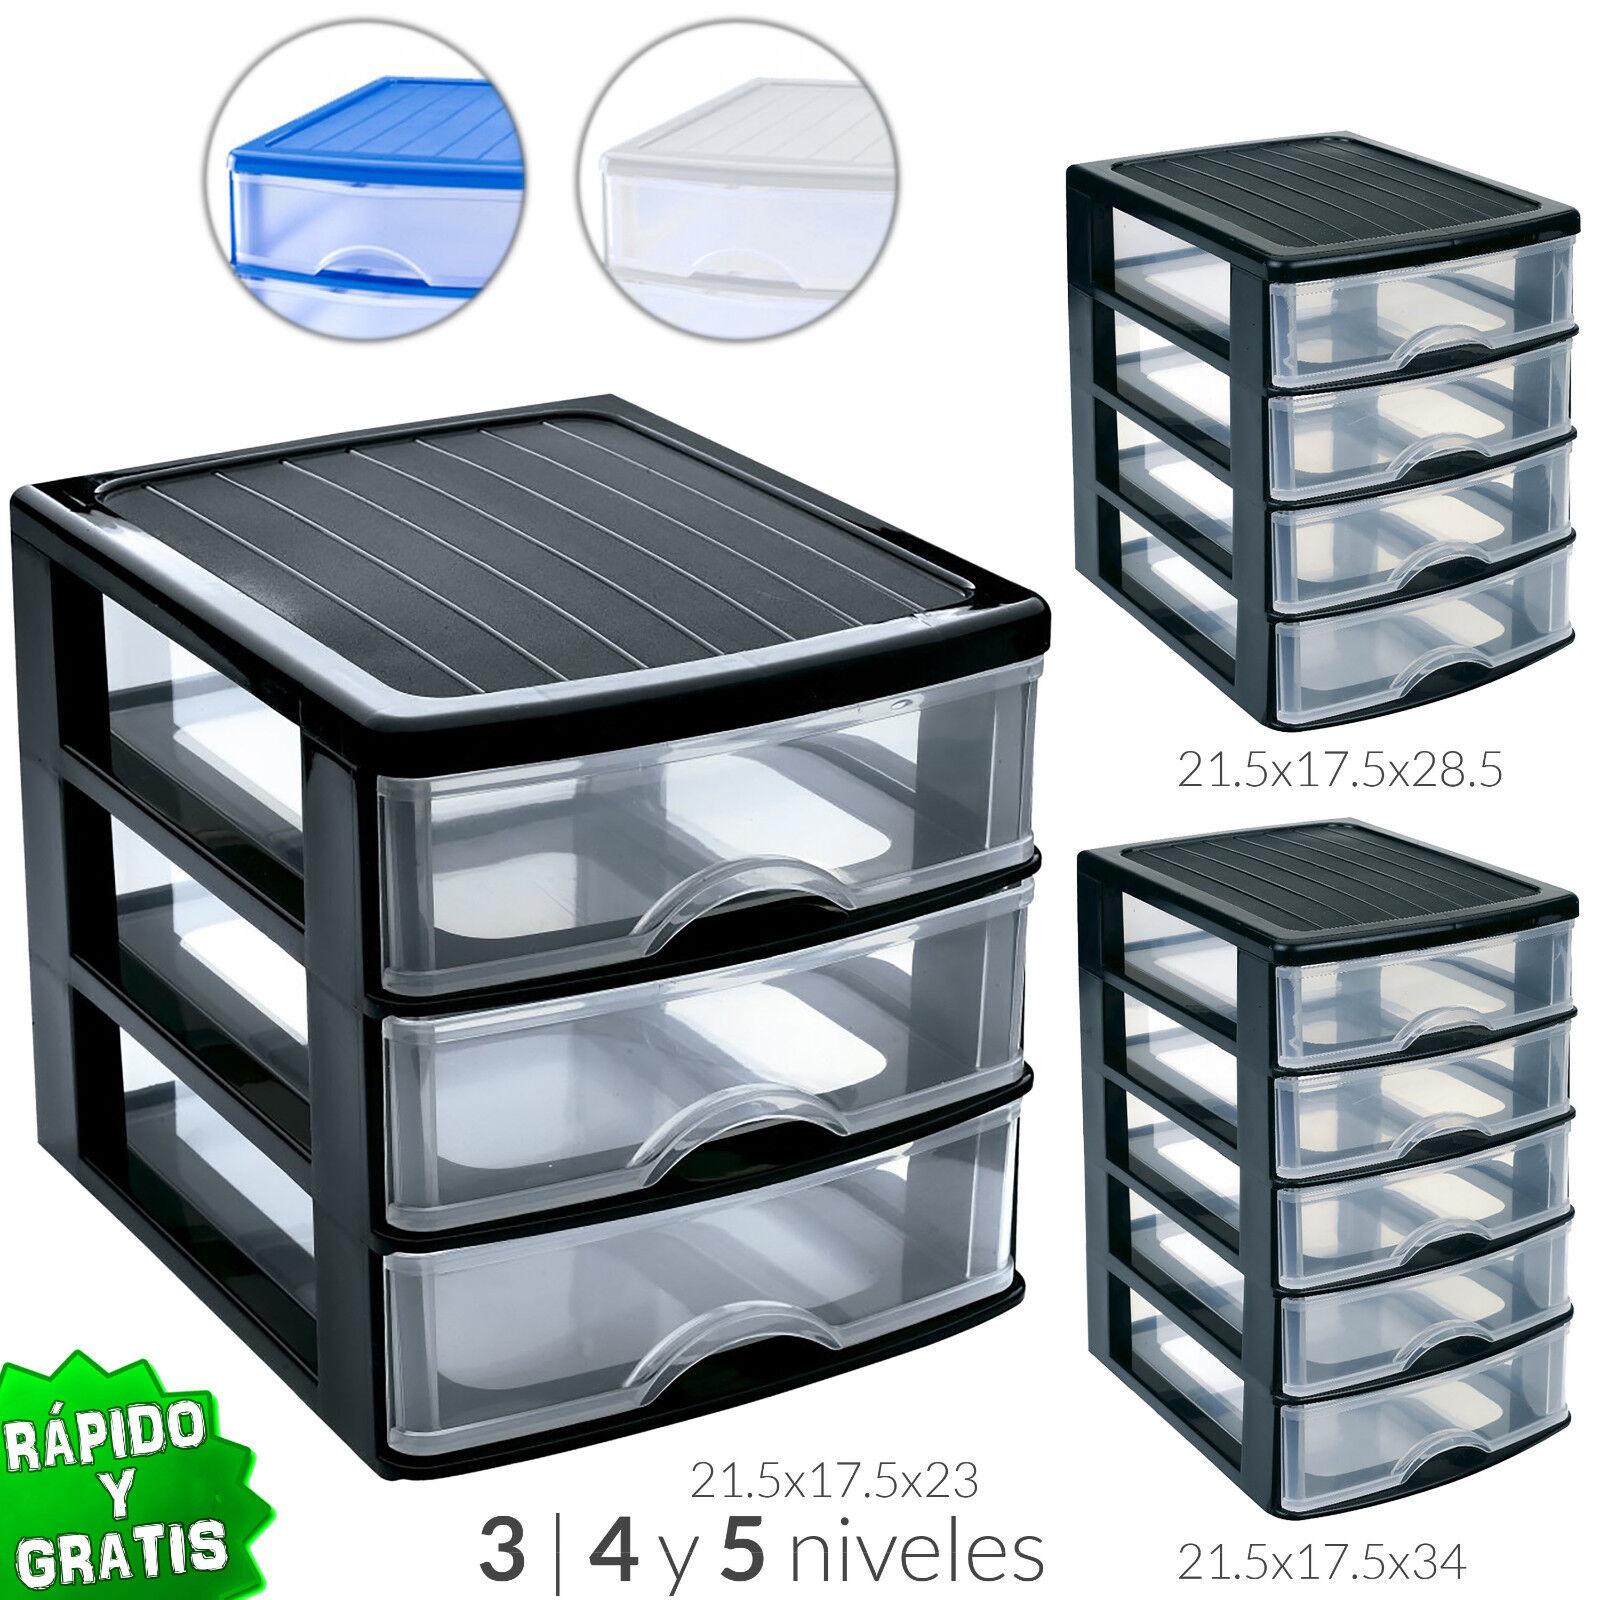 Drawer 3 4 5 Plastic Organiser Storage Cabinets Office Bedro